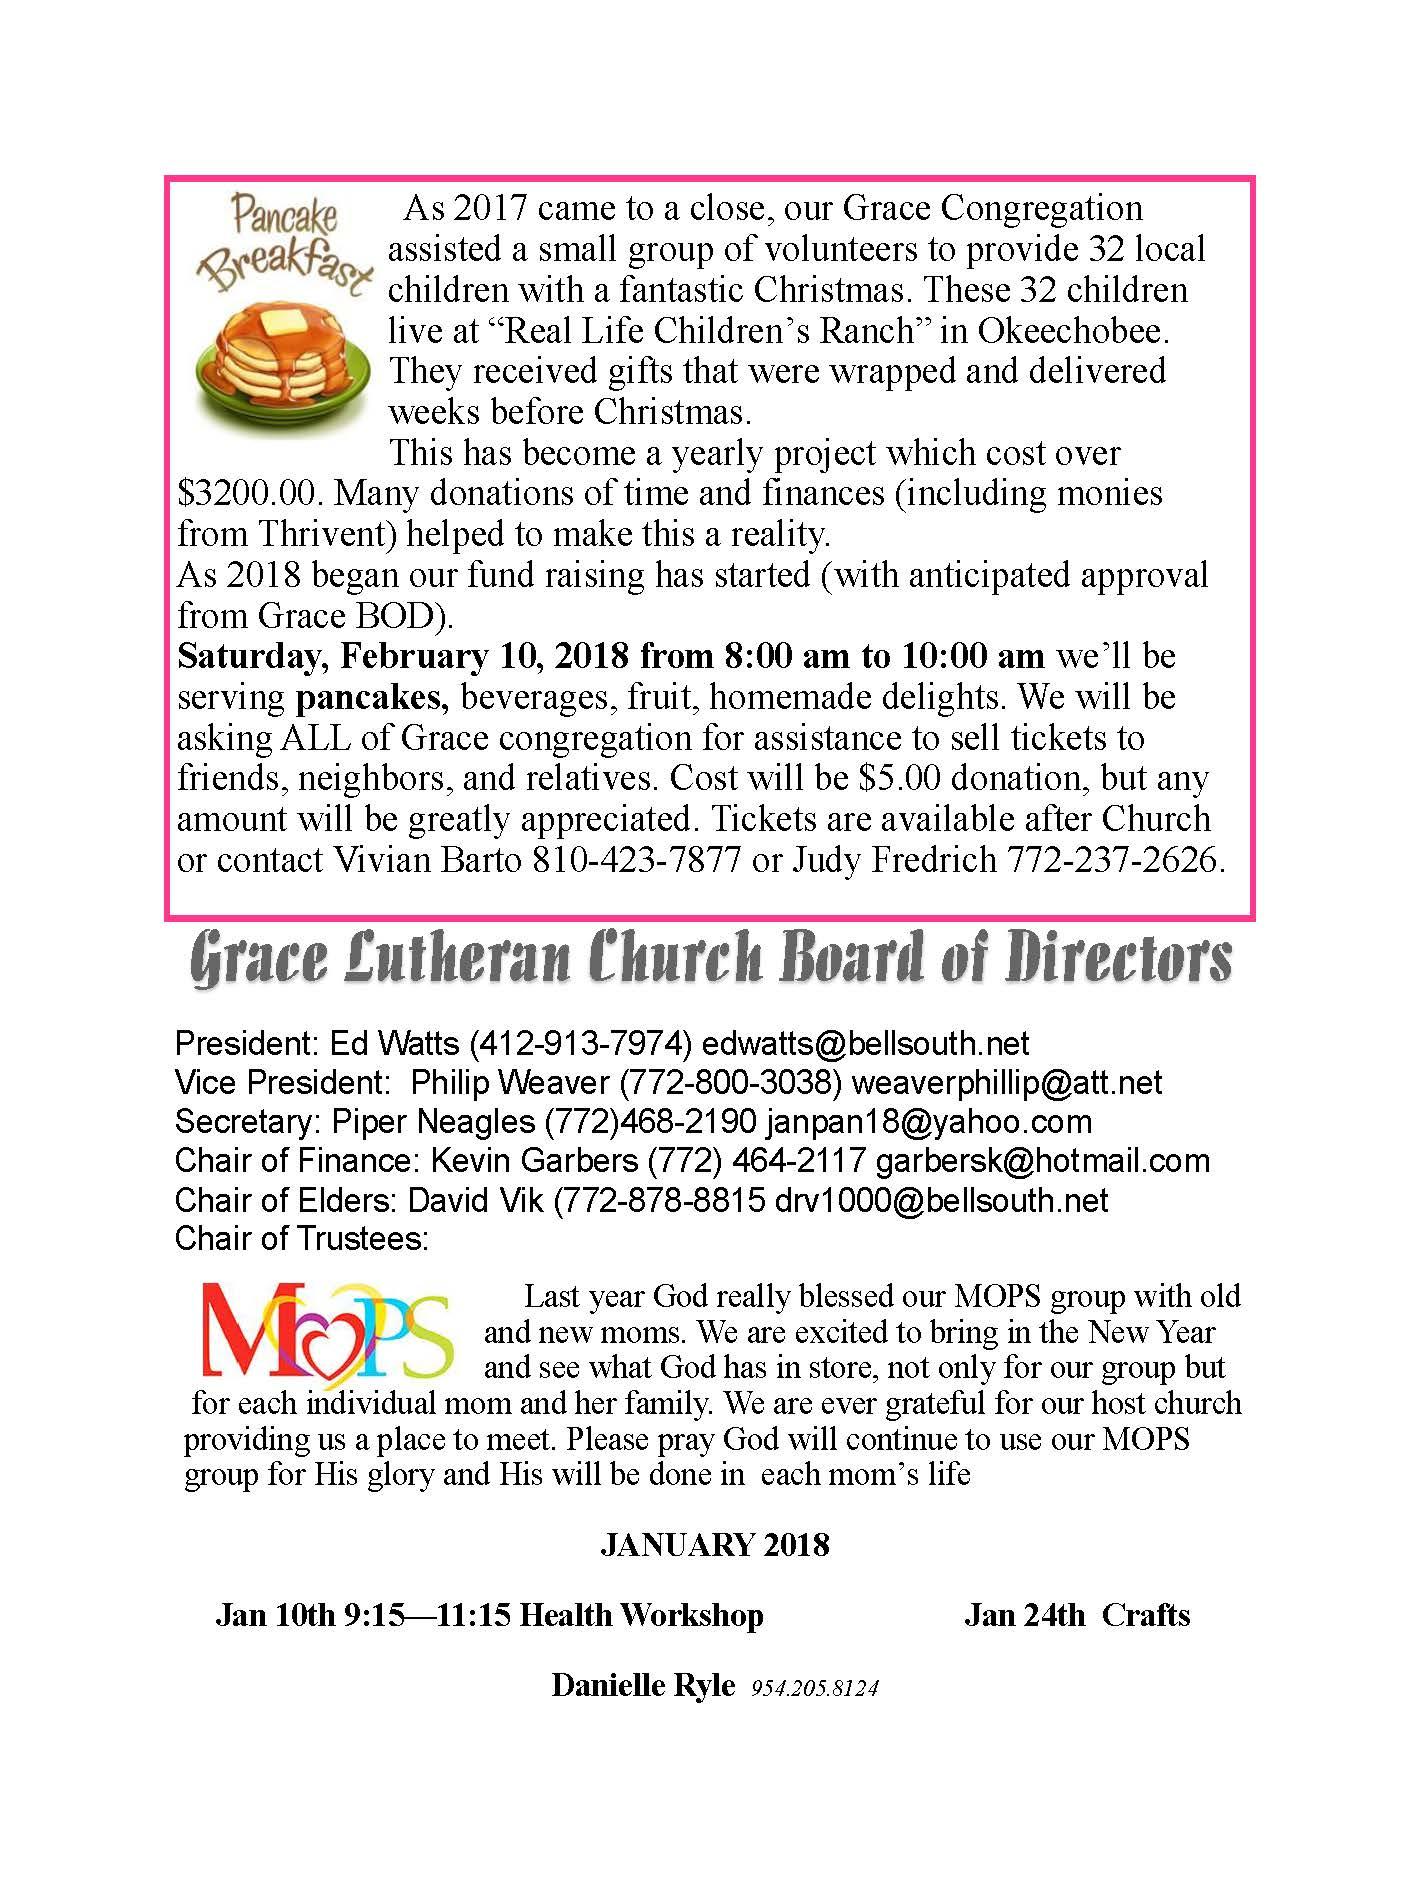 Grace News JAN 2018 pub (1)_Page_06.jpg